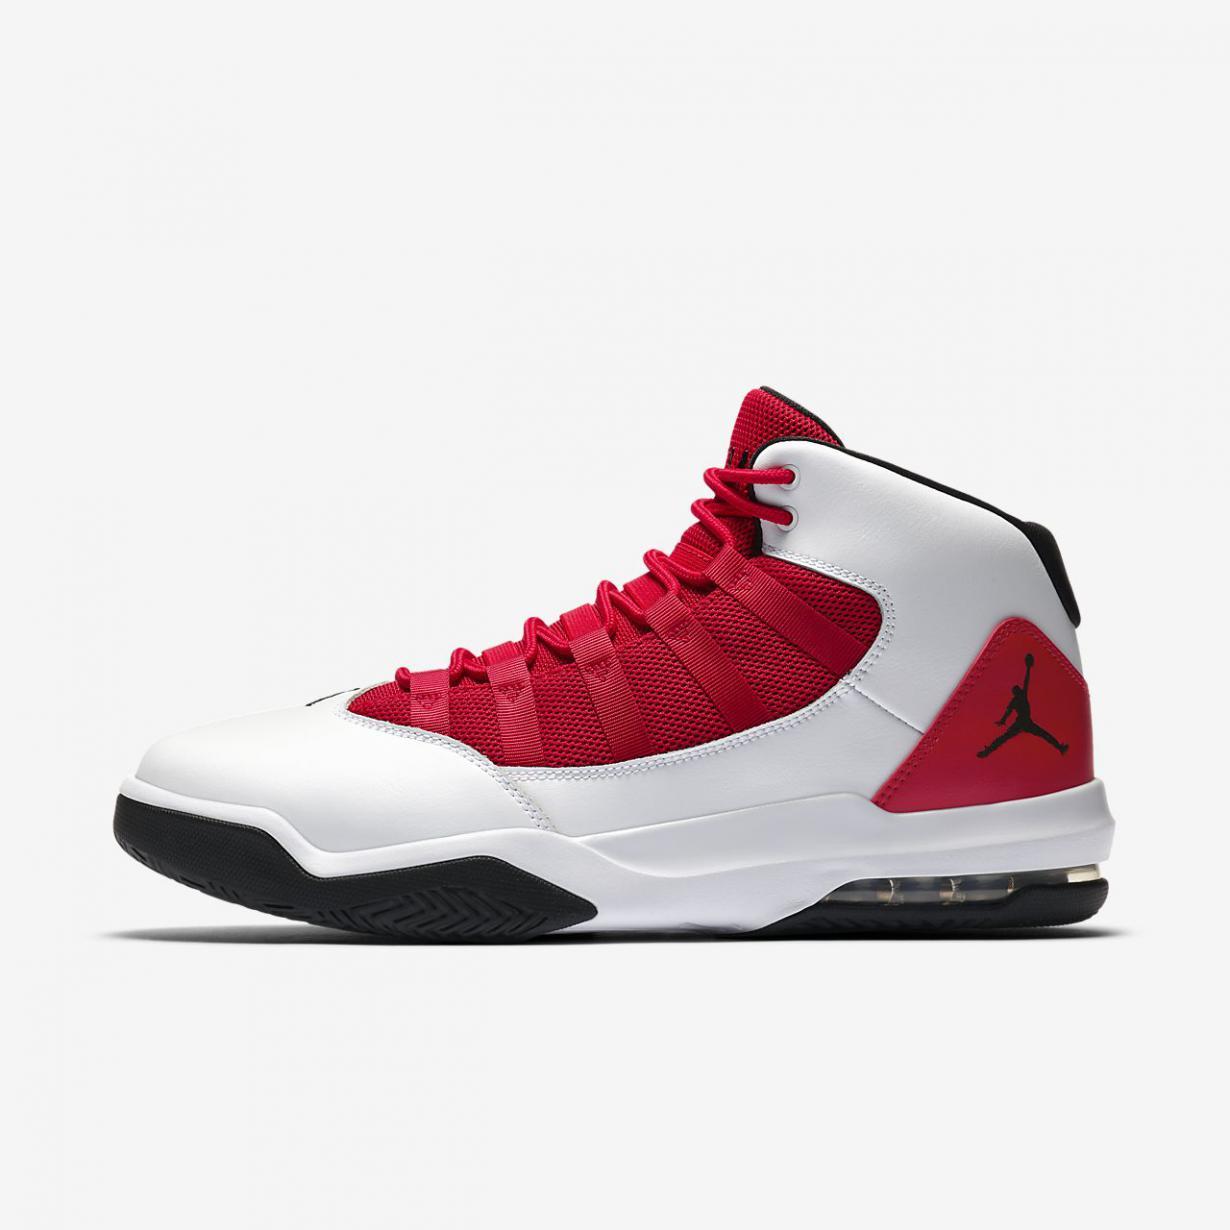 Jordan Max Aura < Nike En Ligne Pas Cher Vente - FR < Gooddaytricities